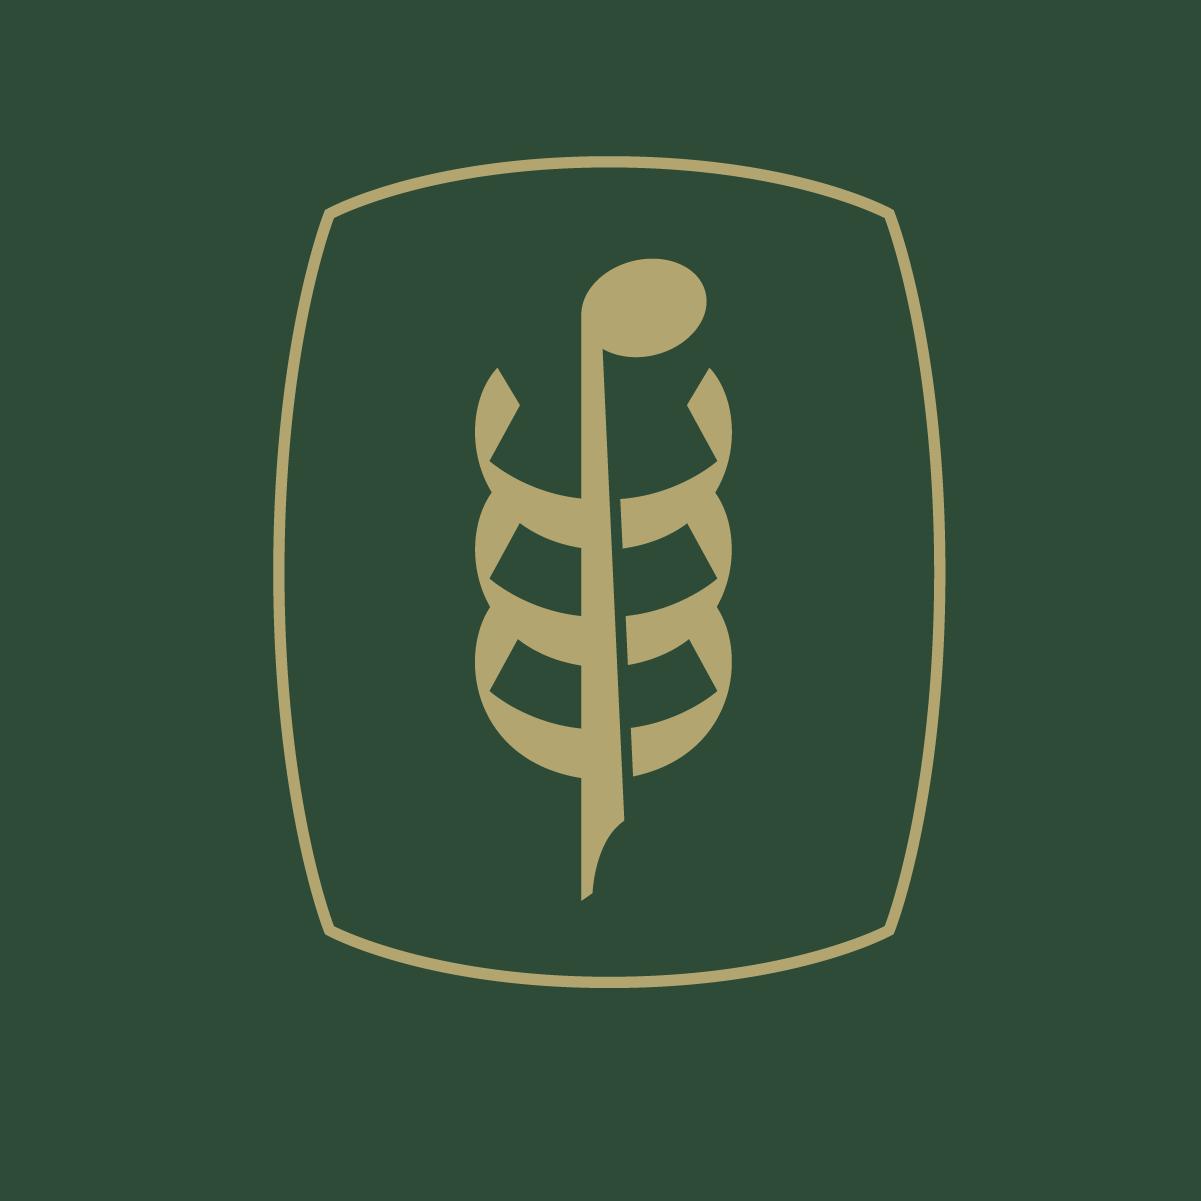 Logo Gold on Green